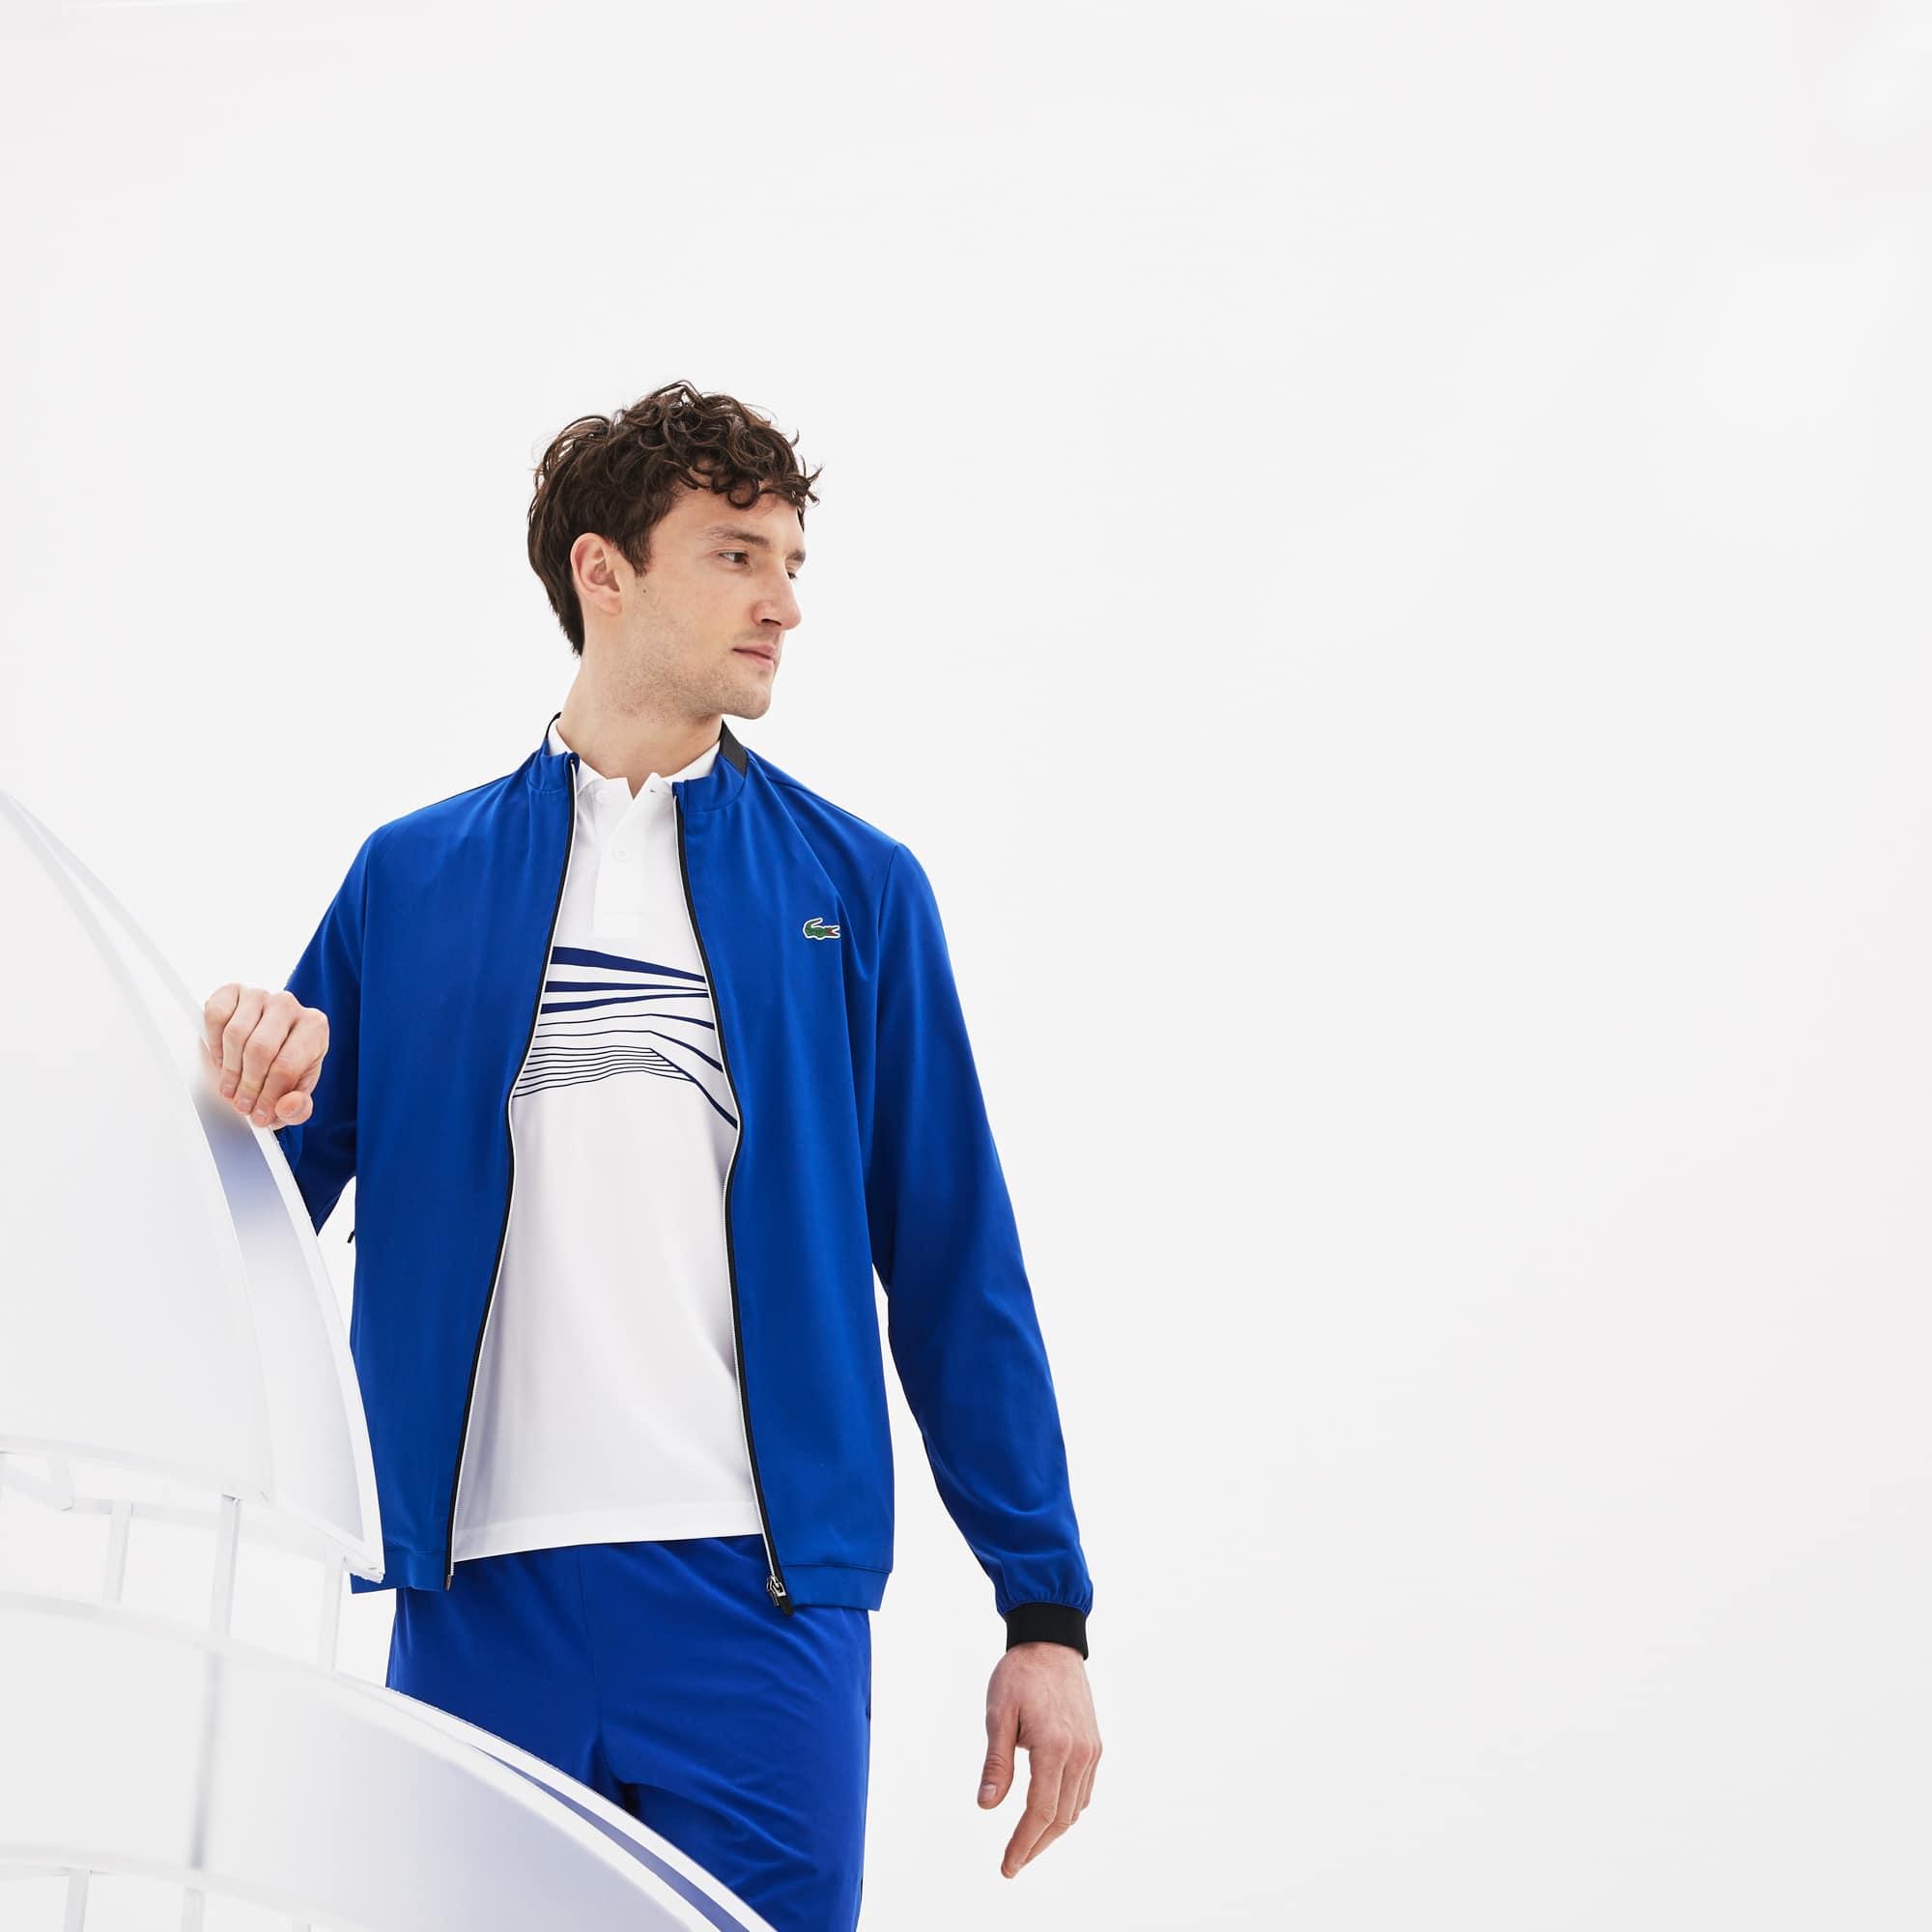 Men's SPORT Novak Djokovic Collection Ultra Light Technical Jacket